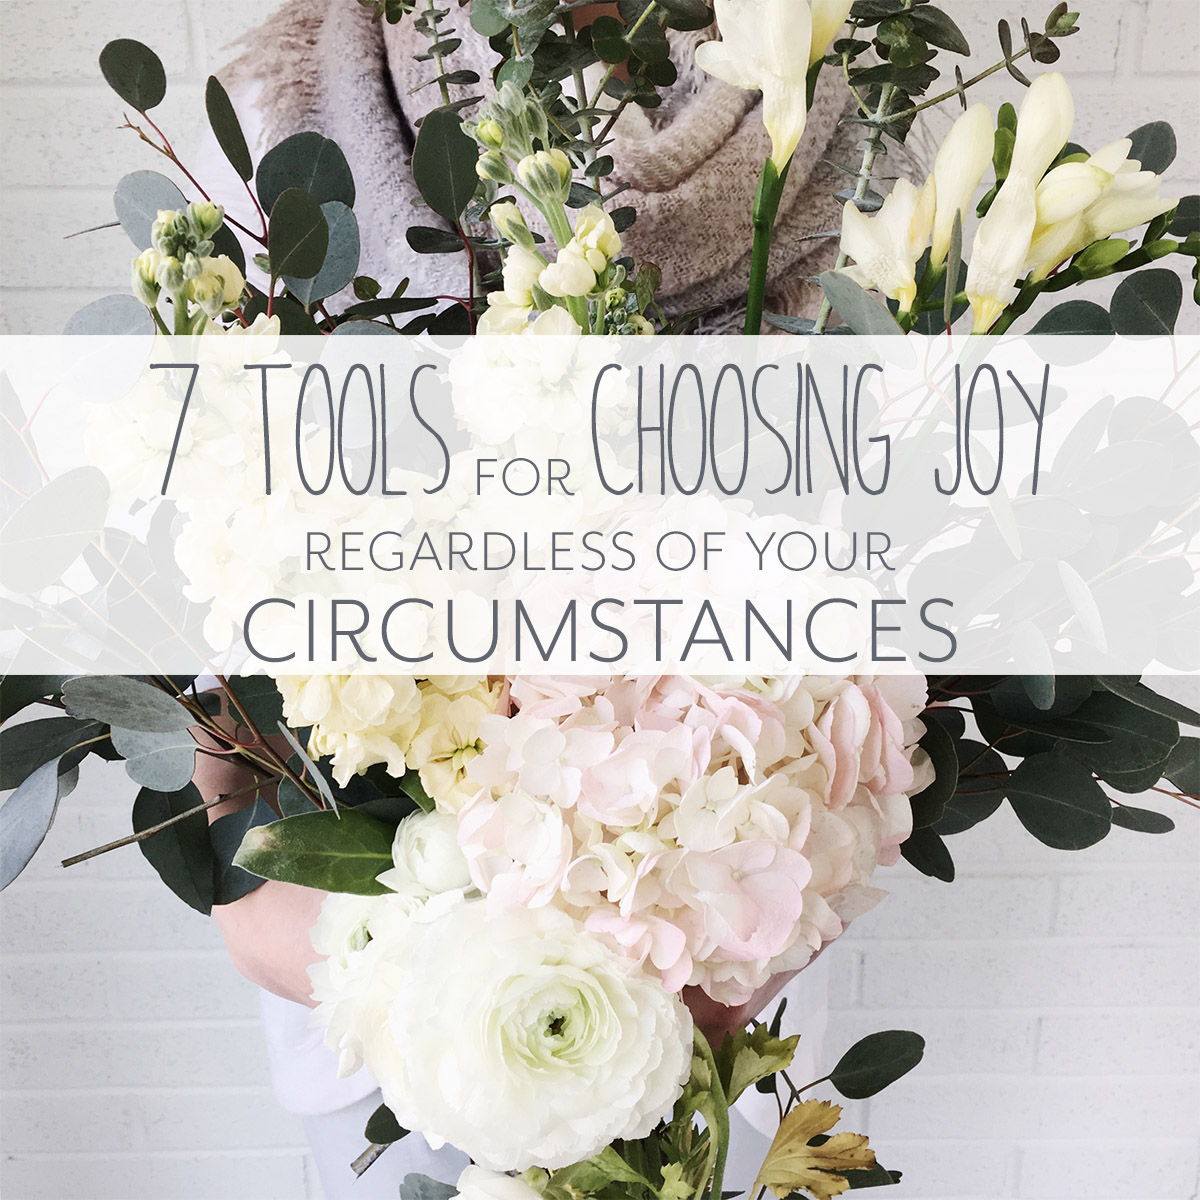 7 Tools for Choosing Joy Regardless of Your Circumstances